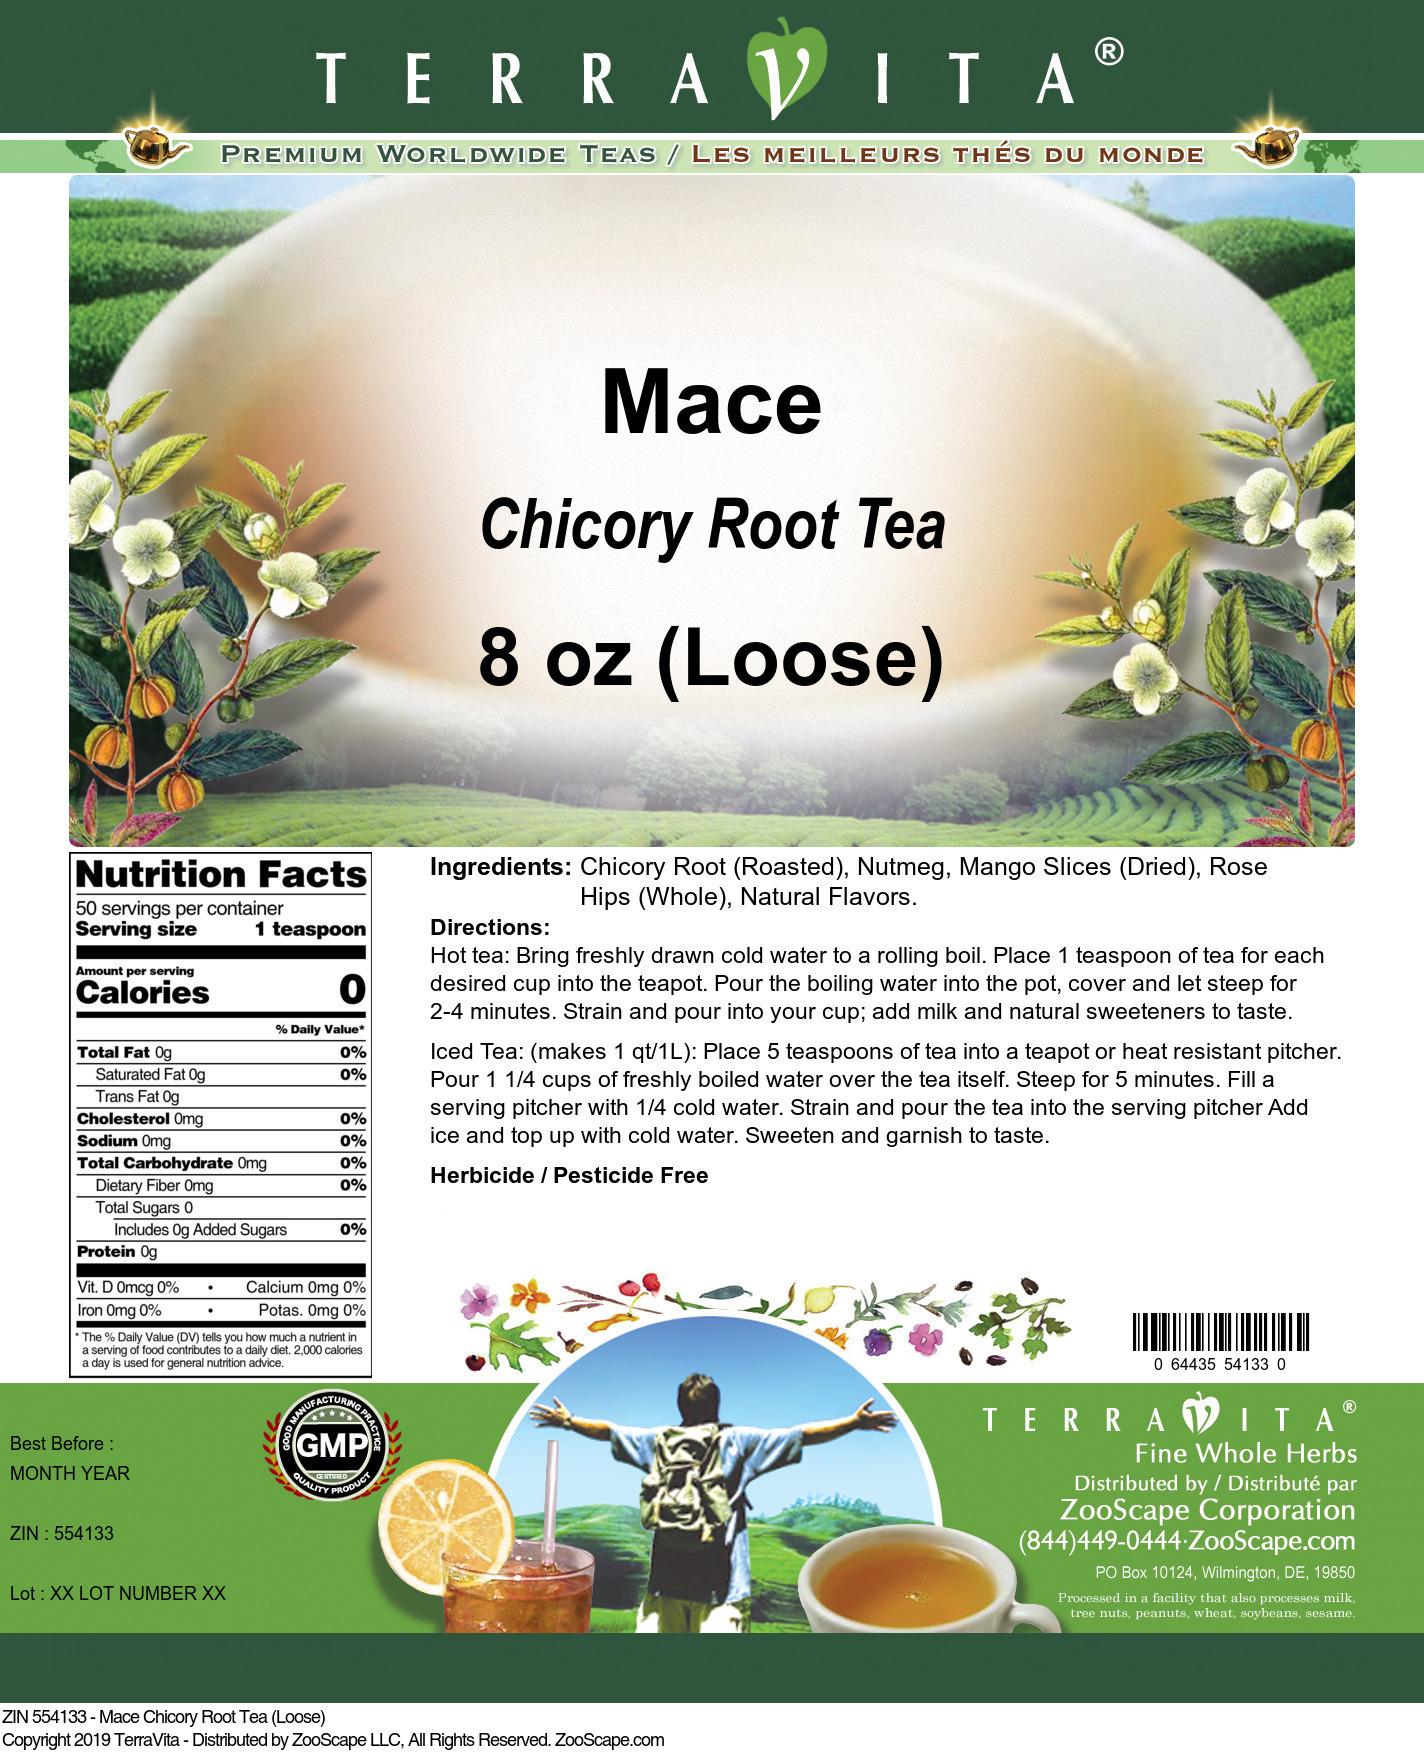 Mace Chicory Root Tea (Loose)